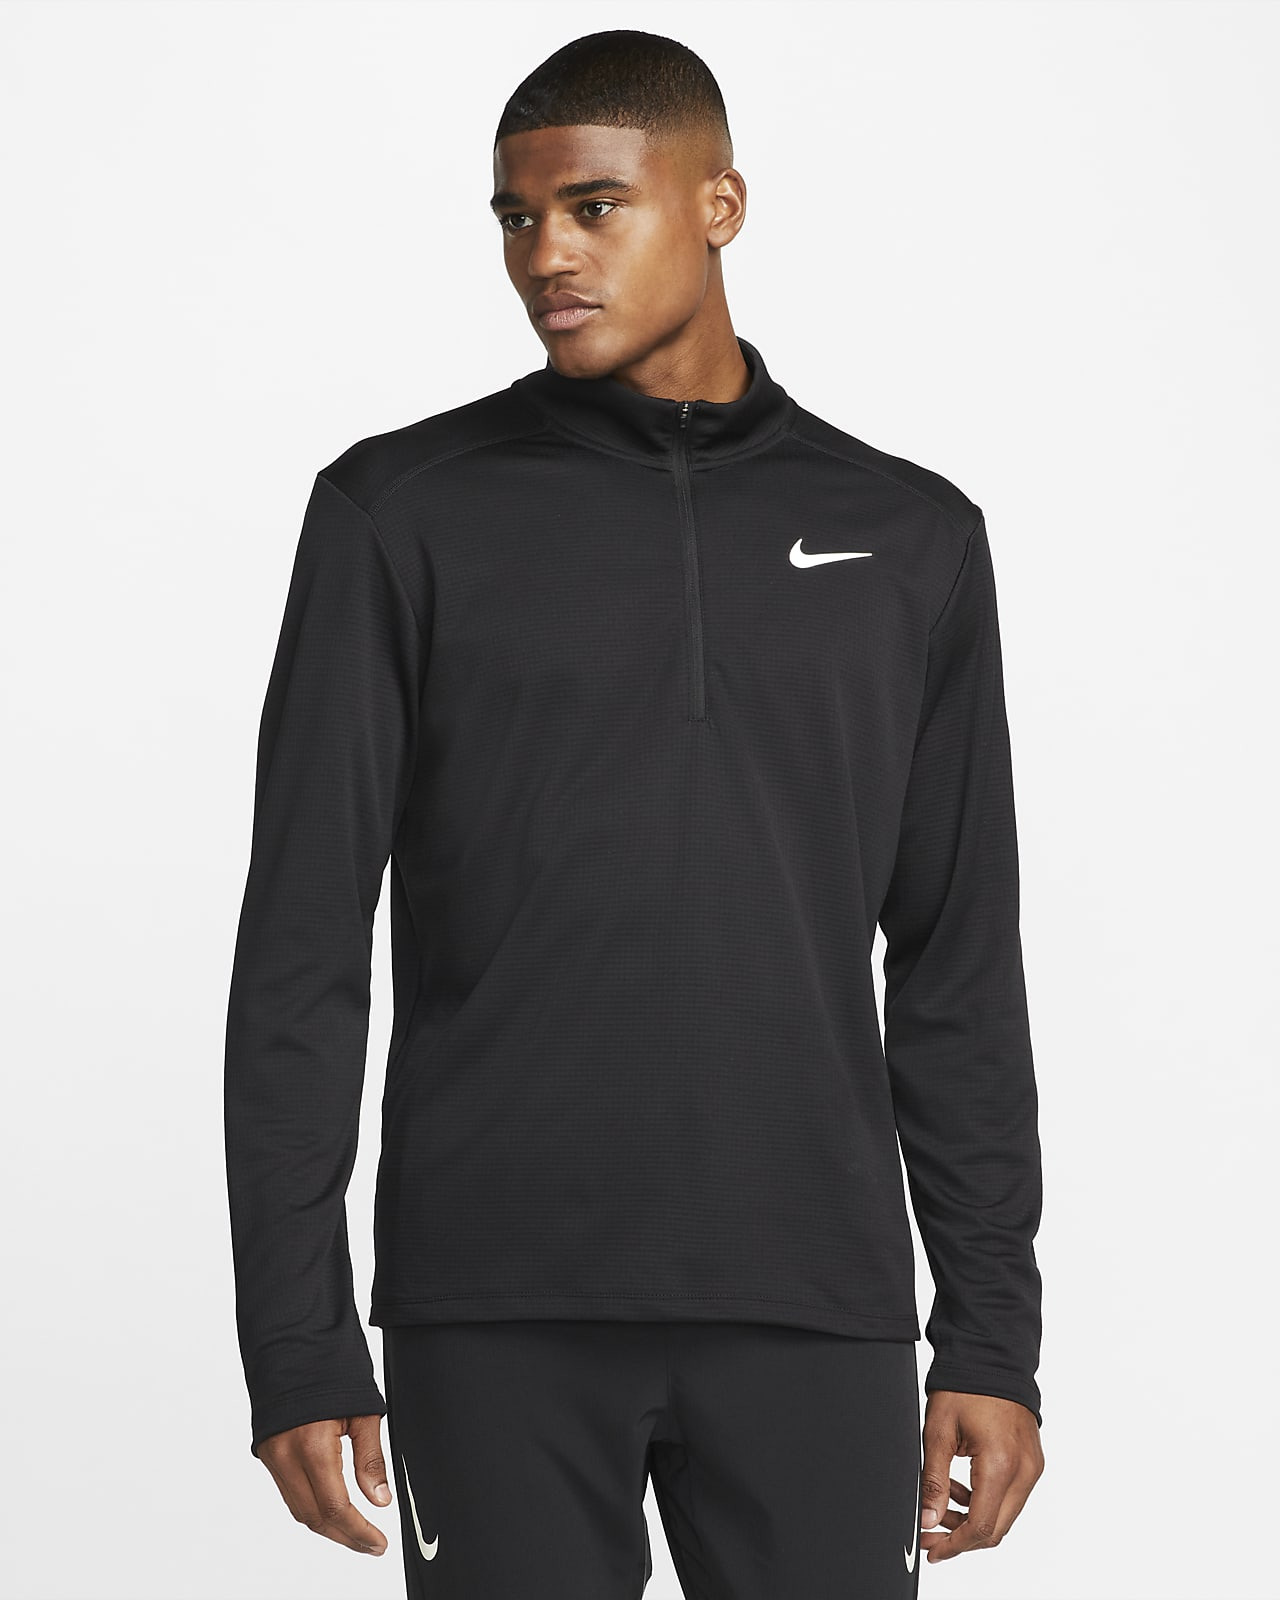 Nike Pacer Camiseta de running con media cremallera - Hombre